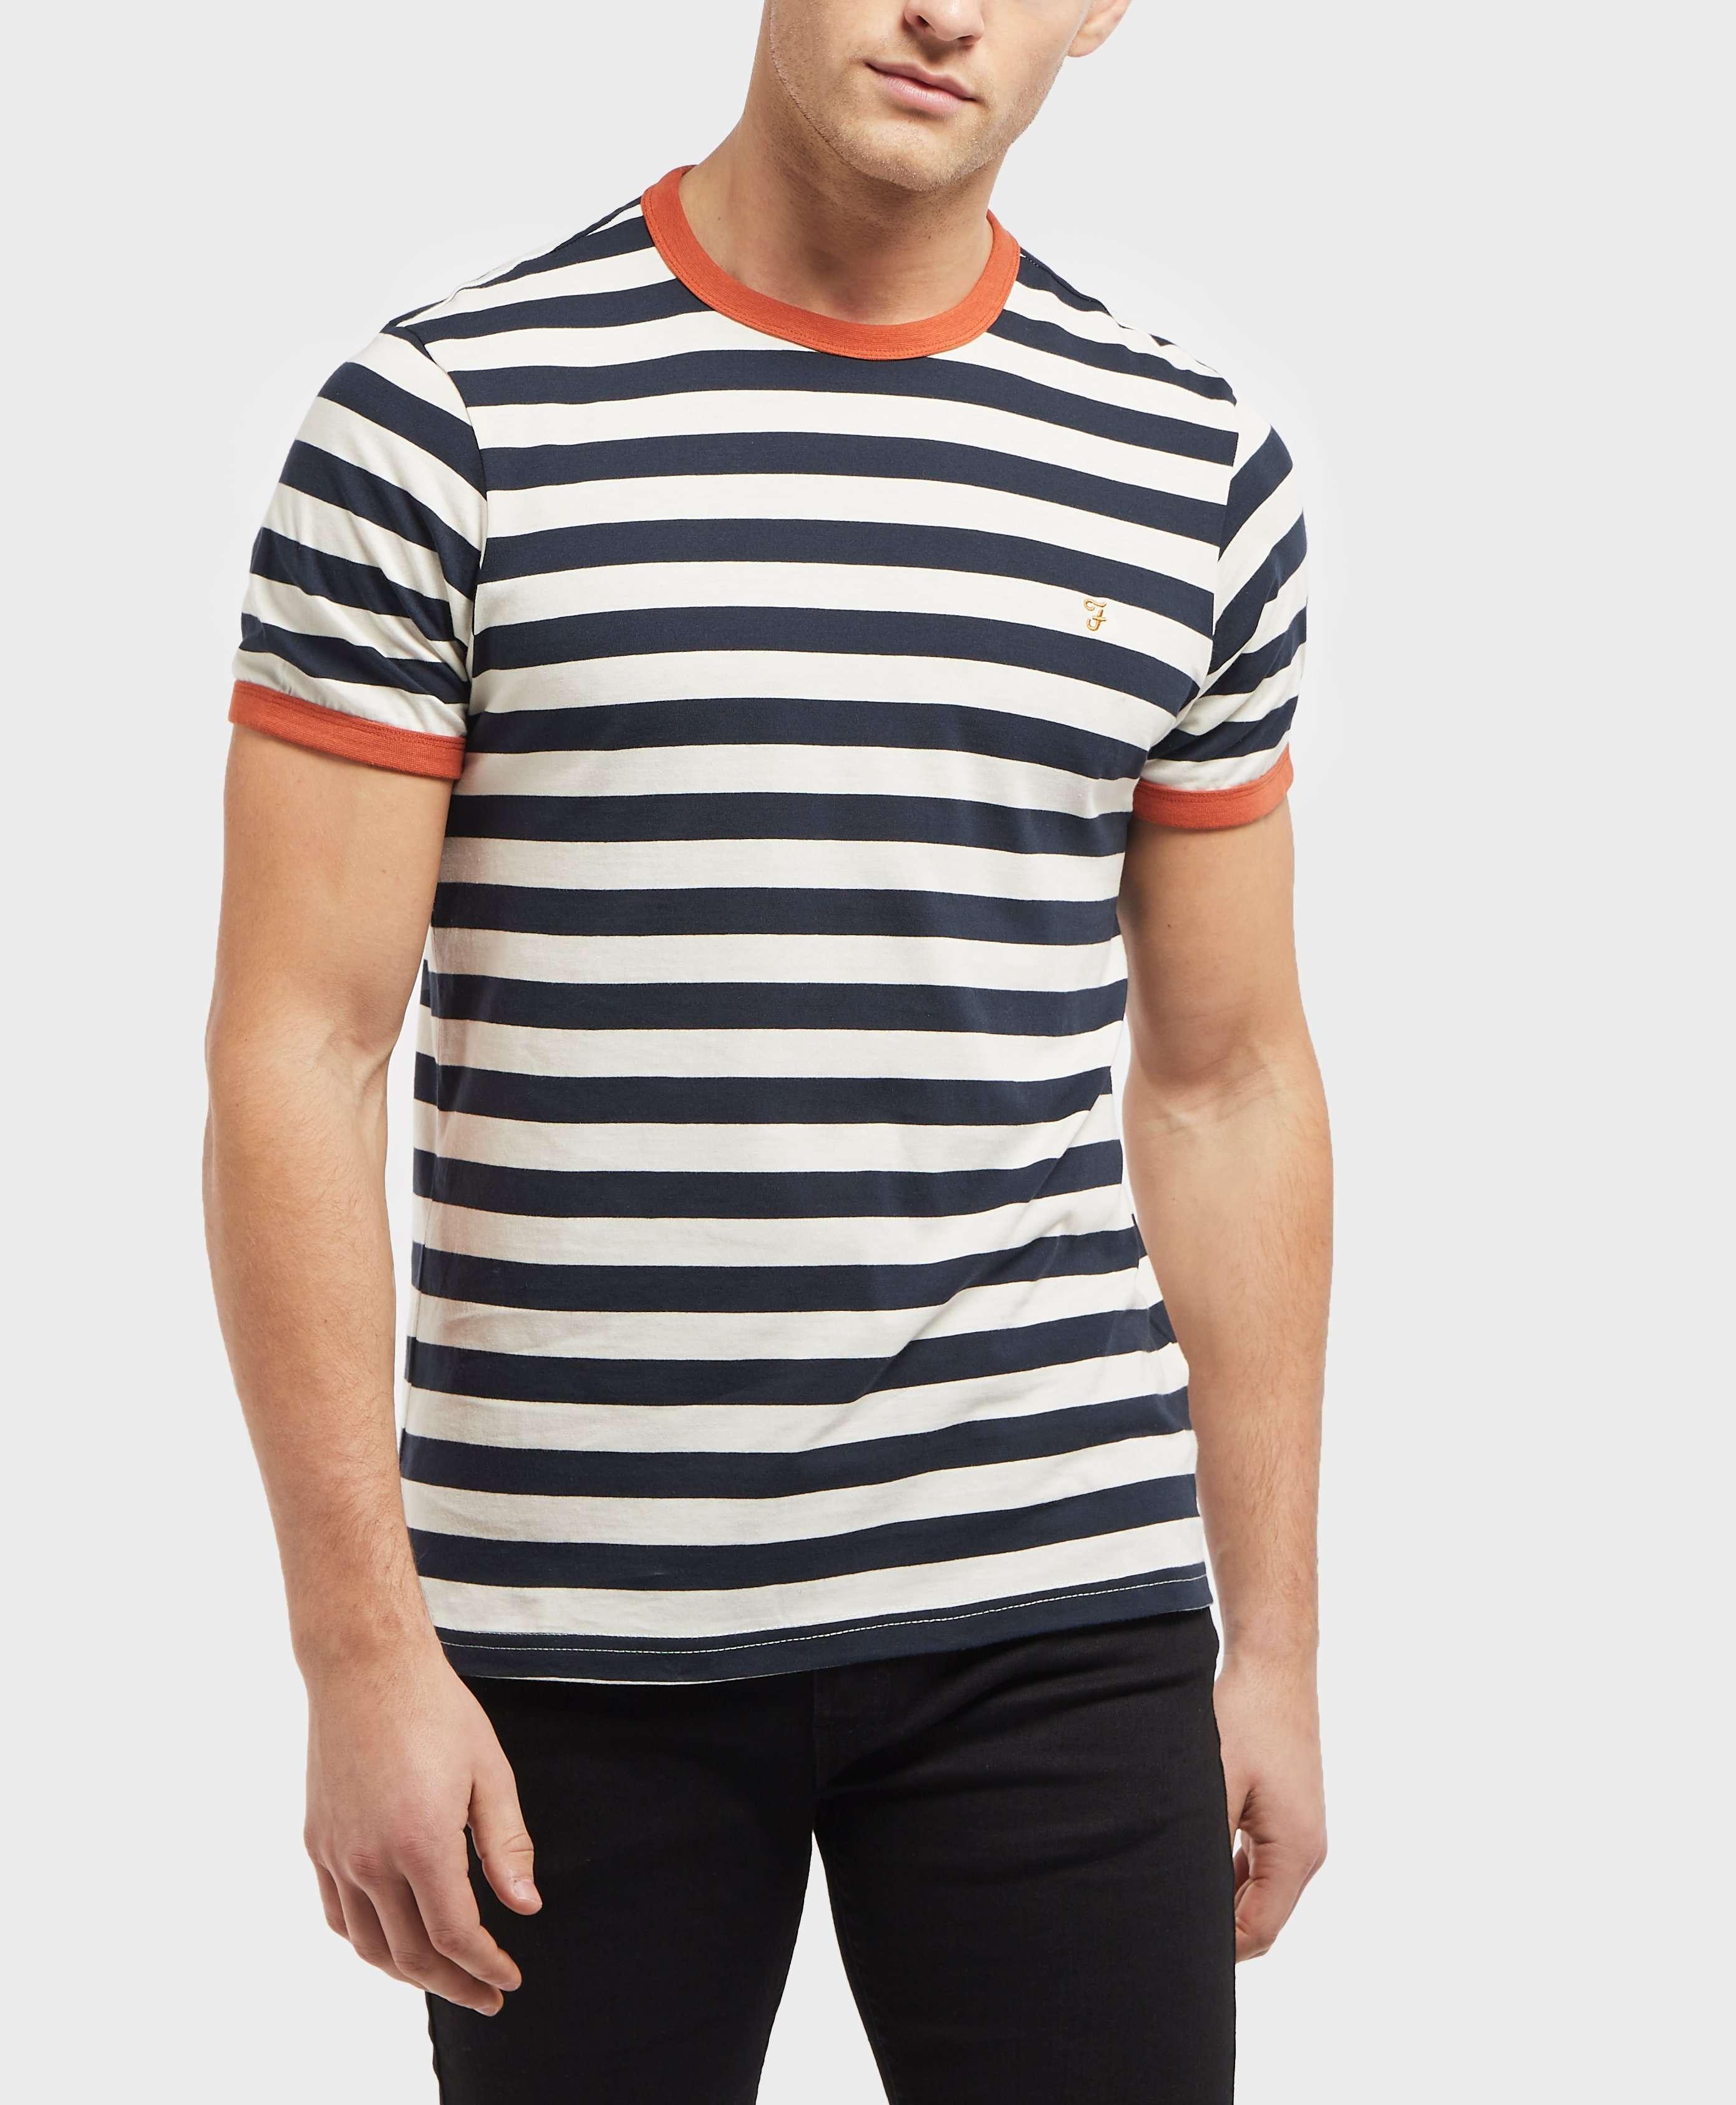 Farah Short Sleeve Stripe T-Shirt - Online Exclusive